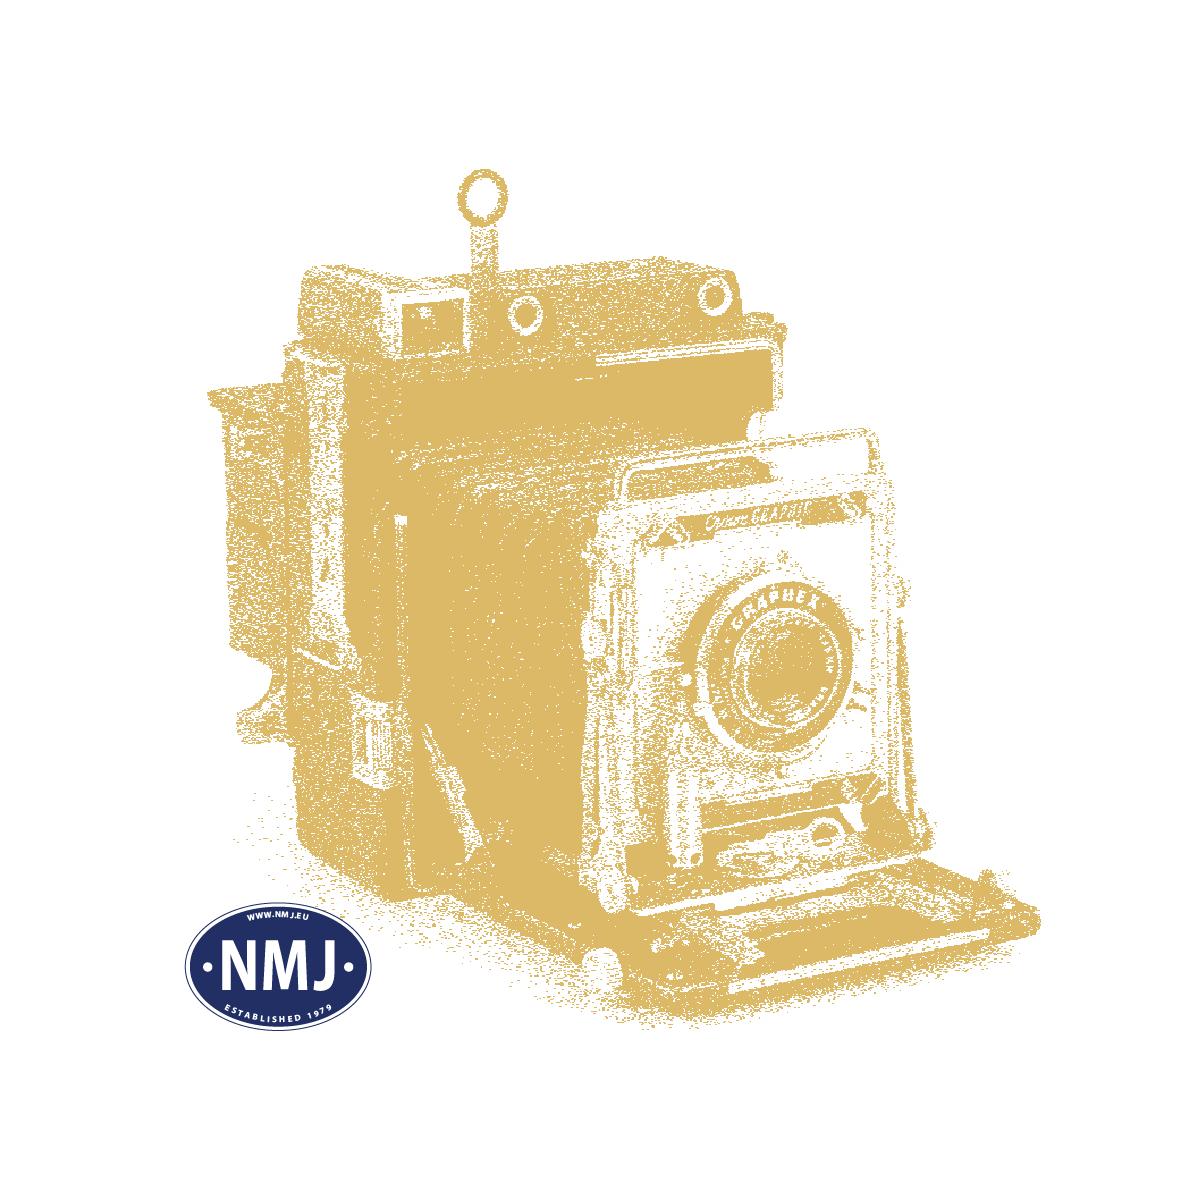 NOC14021 - Tuja i potte, 6 Stk